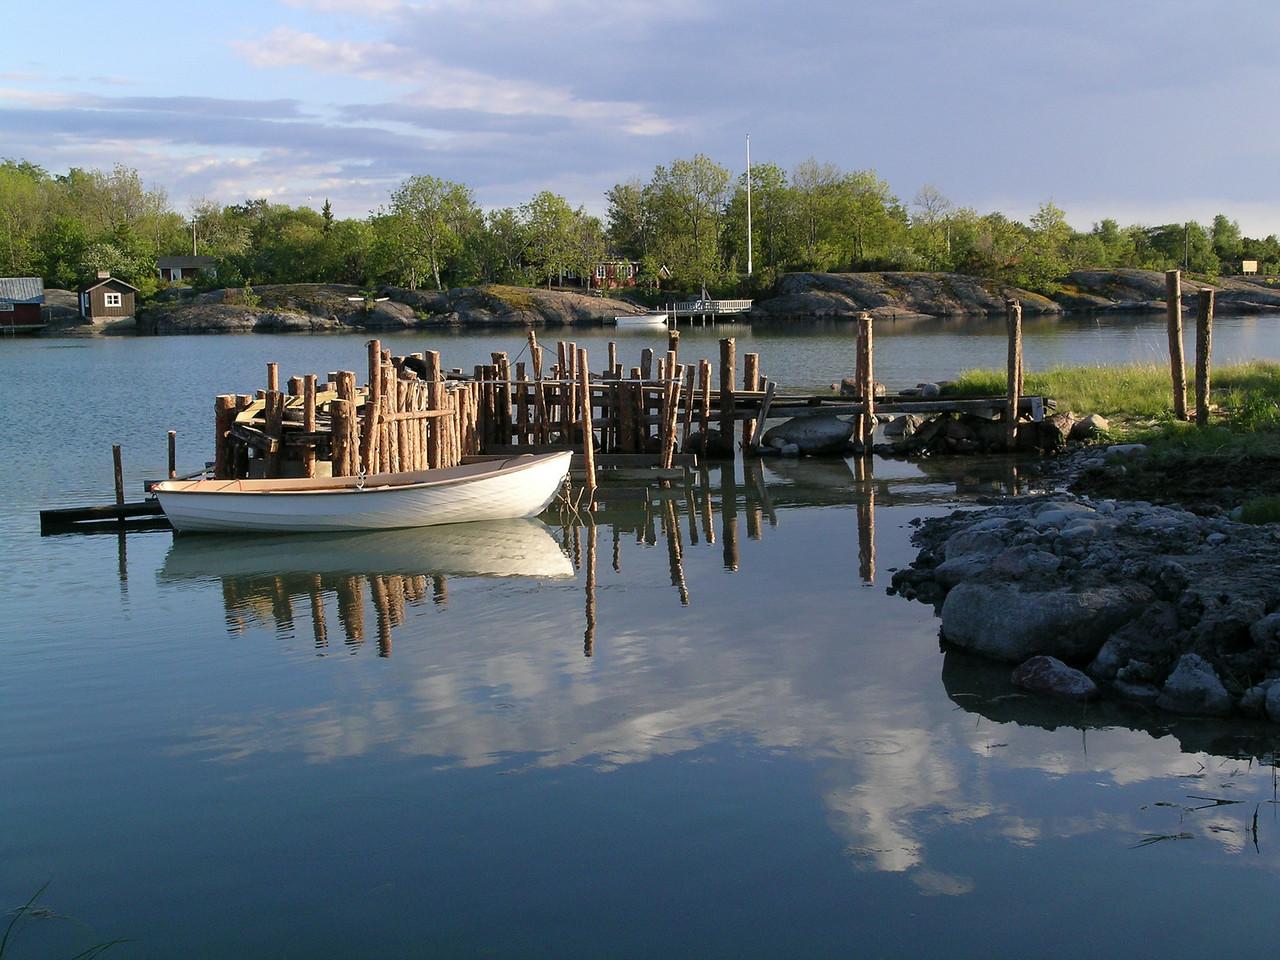 Åland island boat and dock scene, Finland.